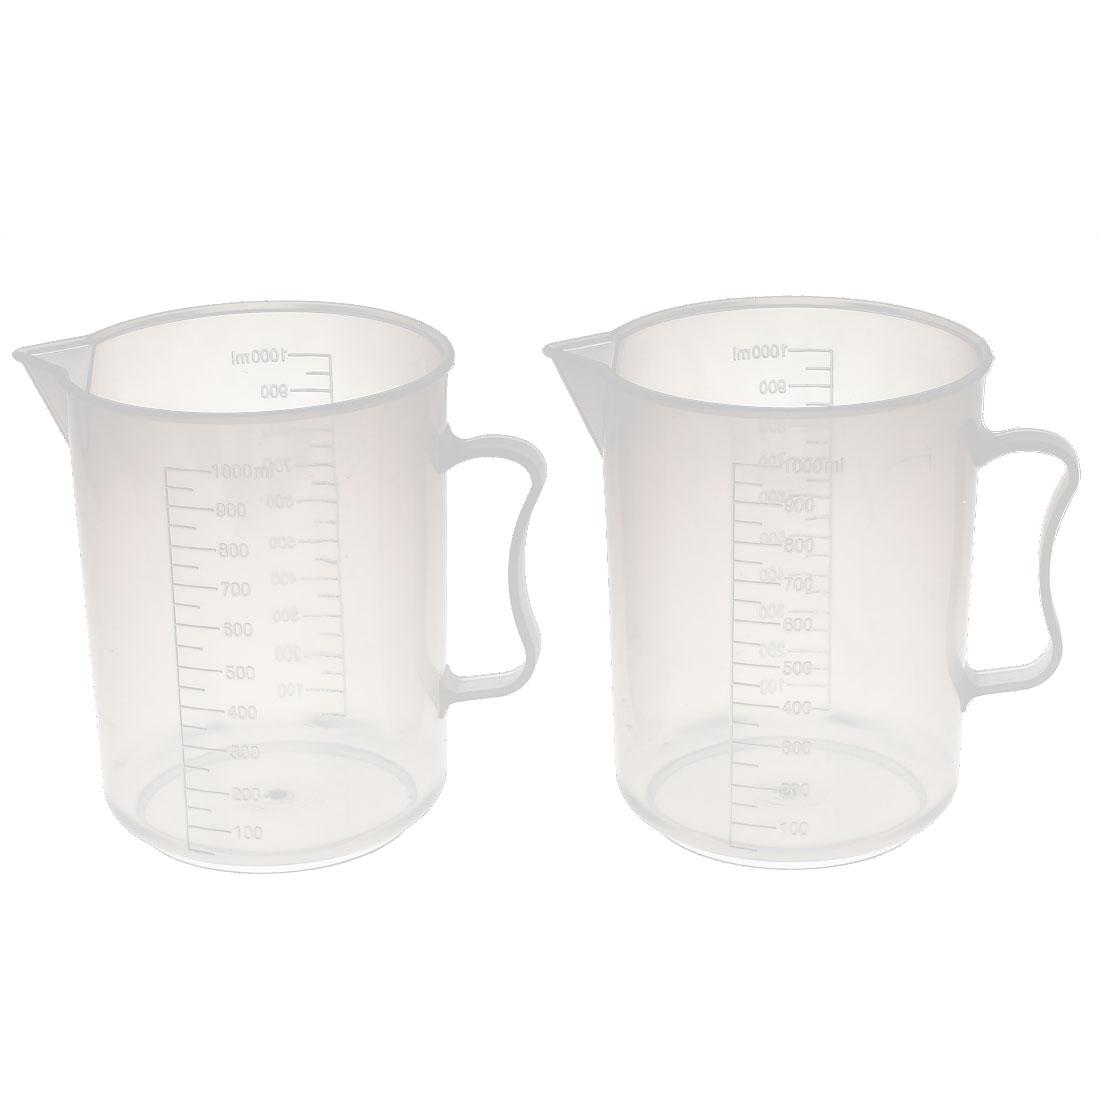 Lab Laboratory Chemistry Experiment 1000mL Graduated Plastic Liquid Testing Measuring Measure Cup 2pcs